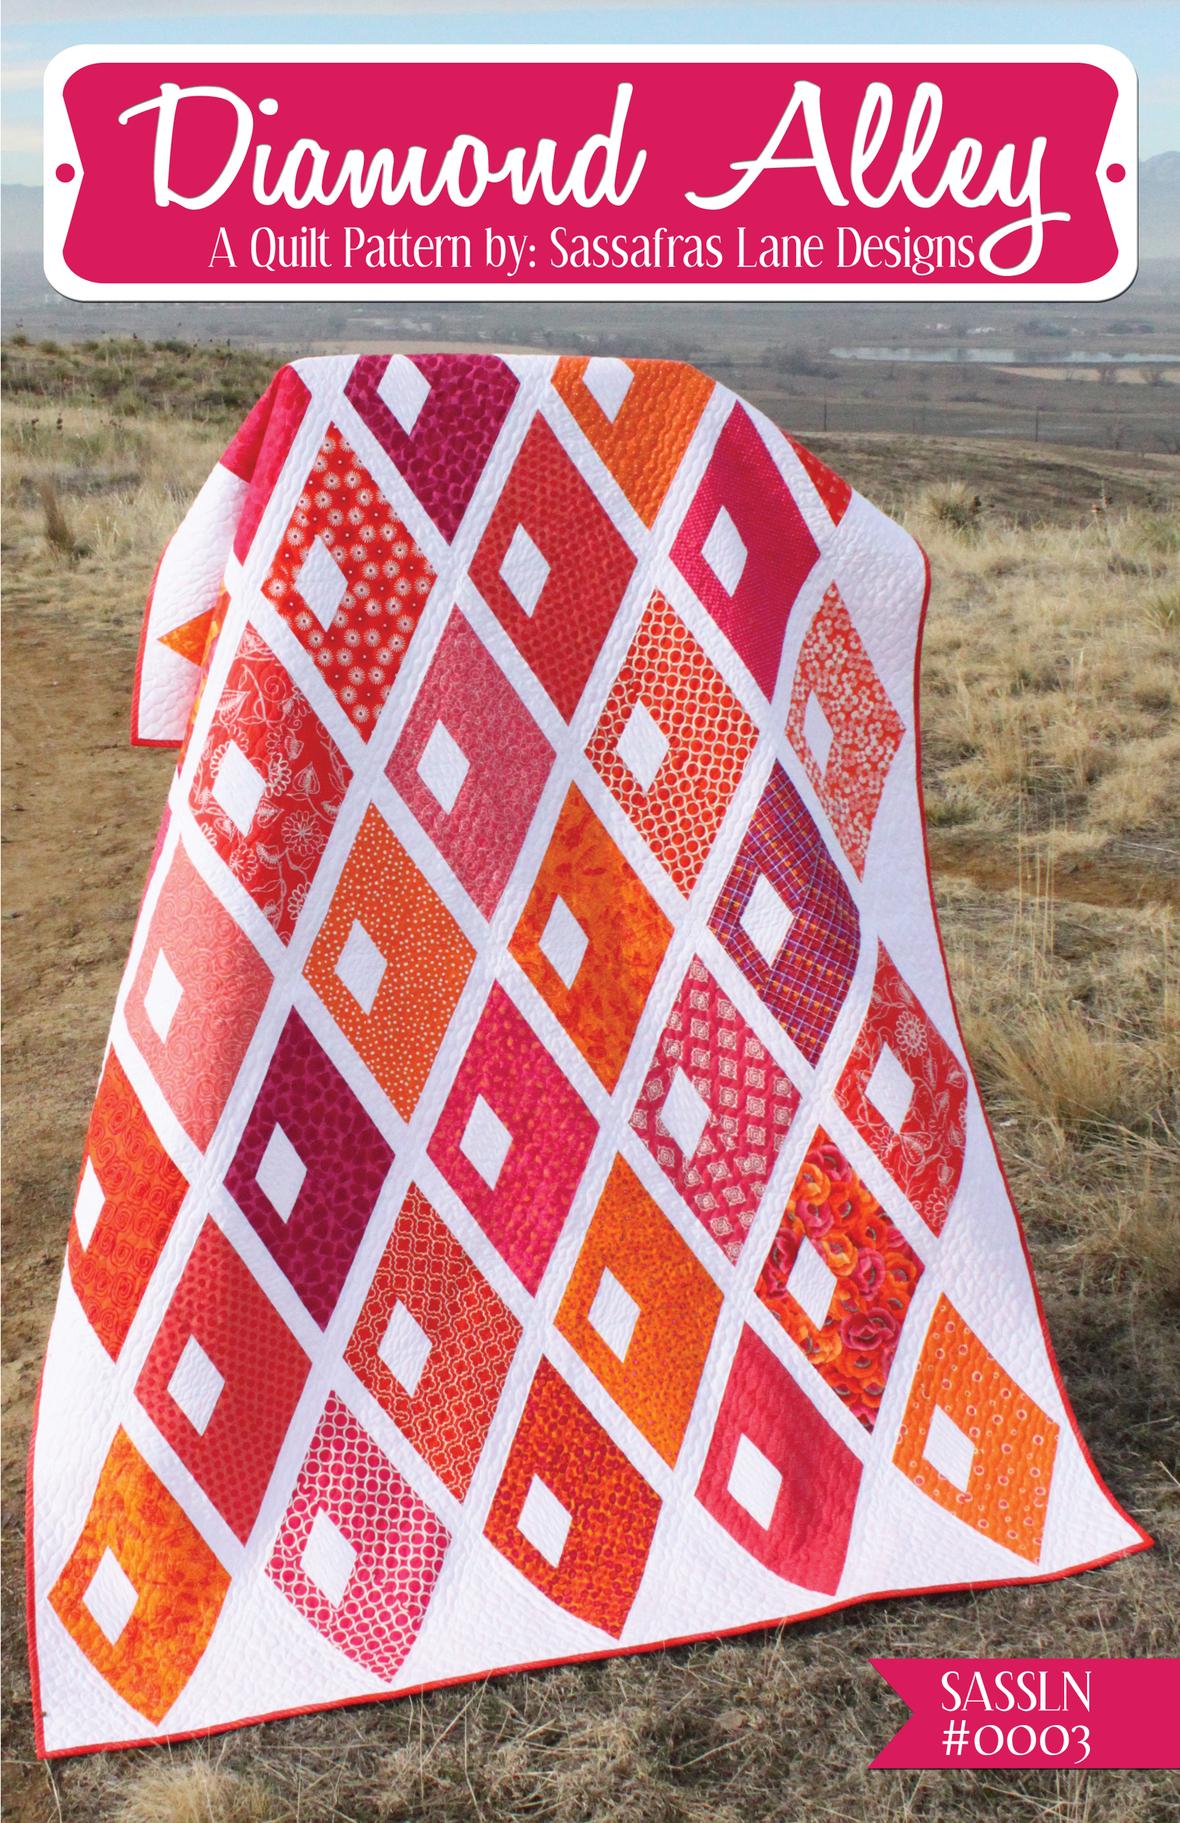 sassafras lane designs diamond alley sewing pattern